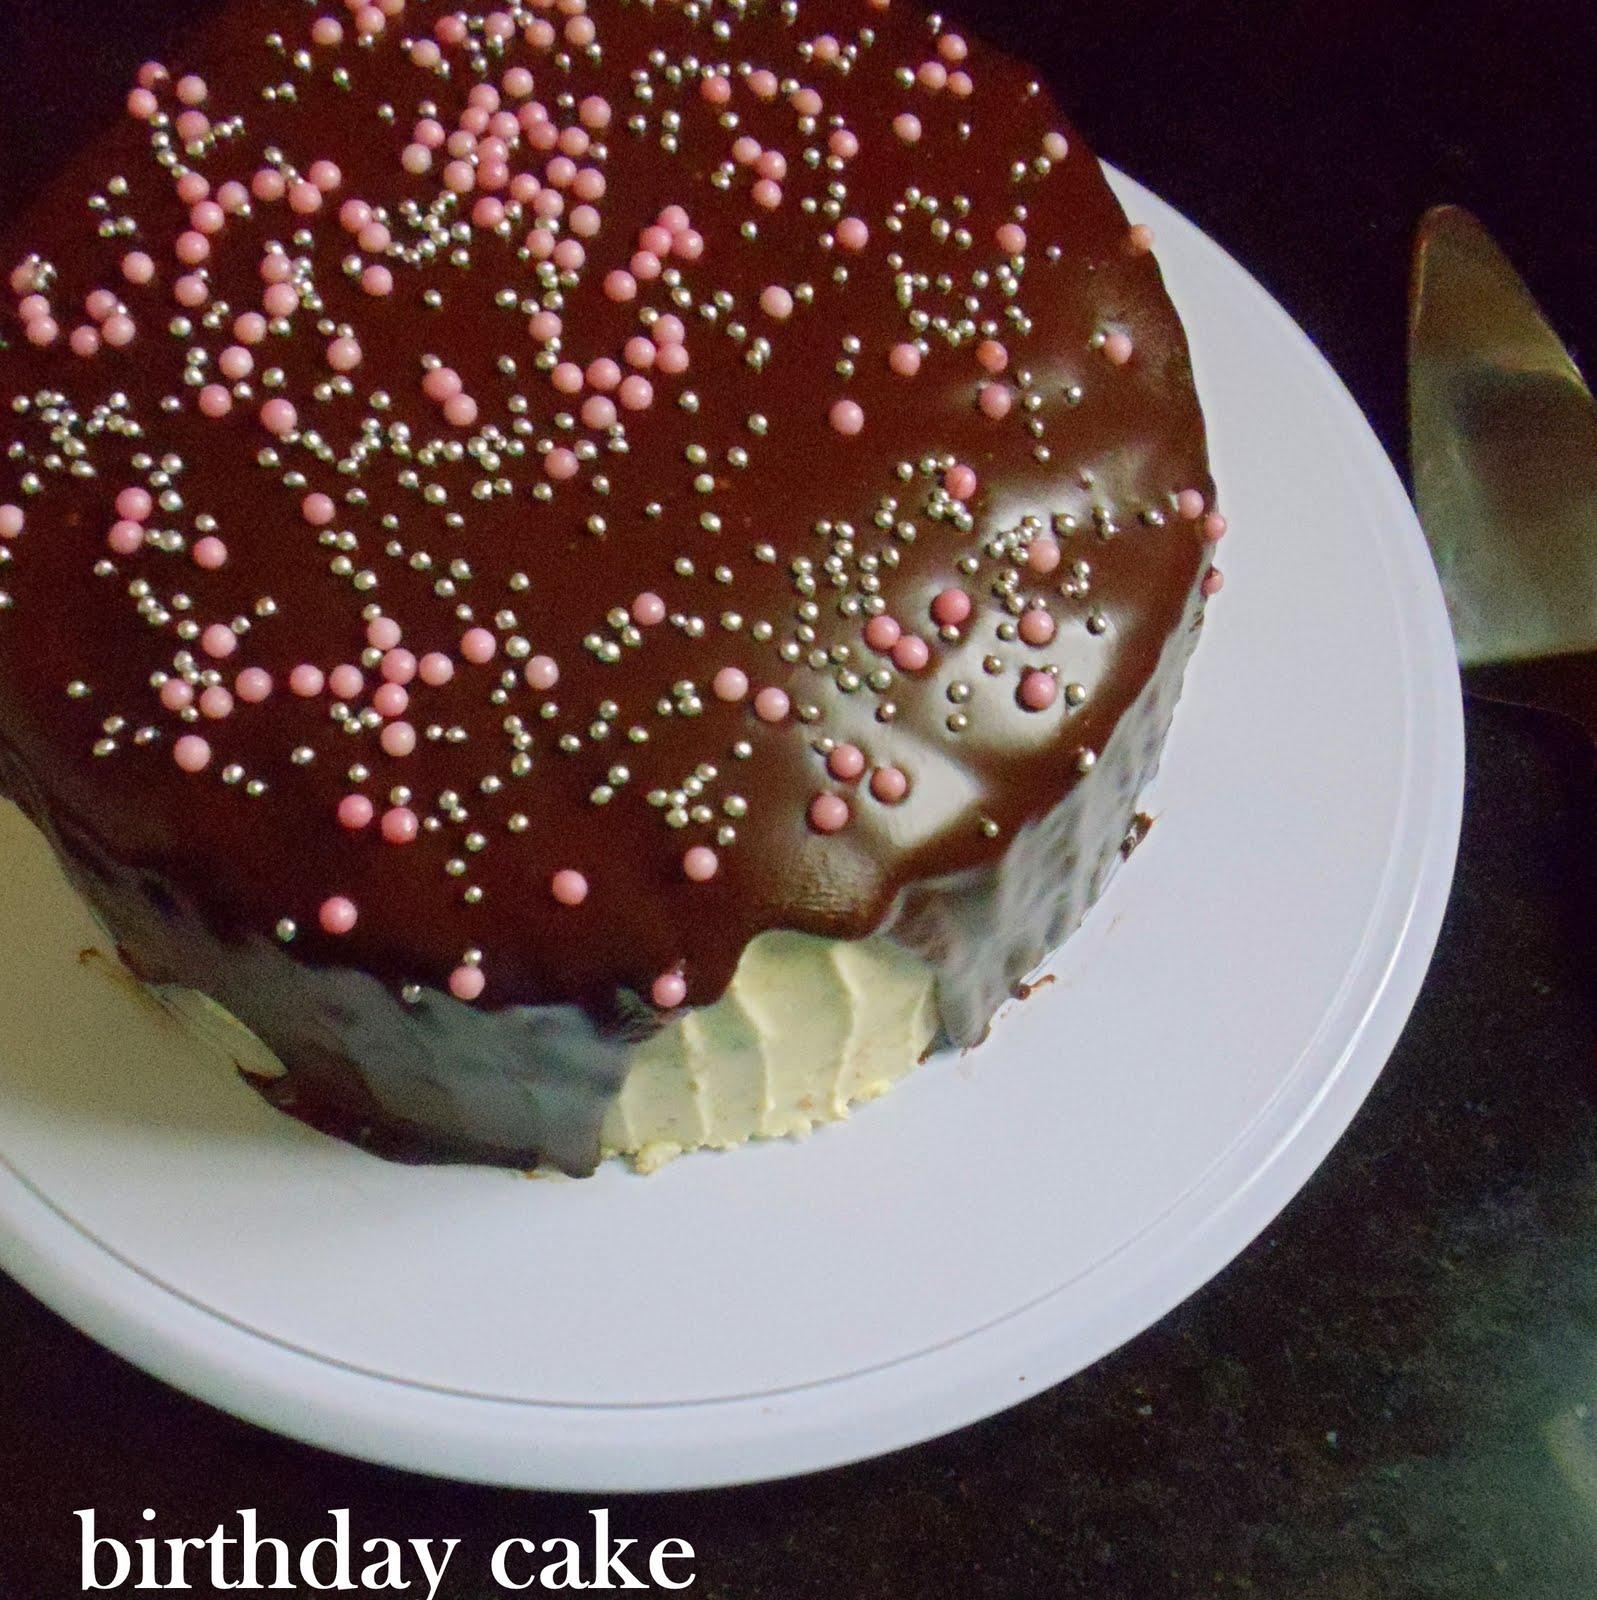 My Broken Eggshells My 18th Birthday Dinner: Cherie's Stolen Recipes: Dad's Birthday Cake